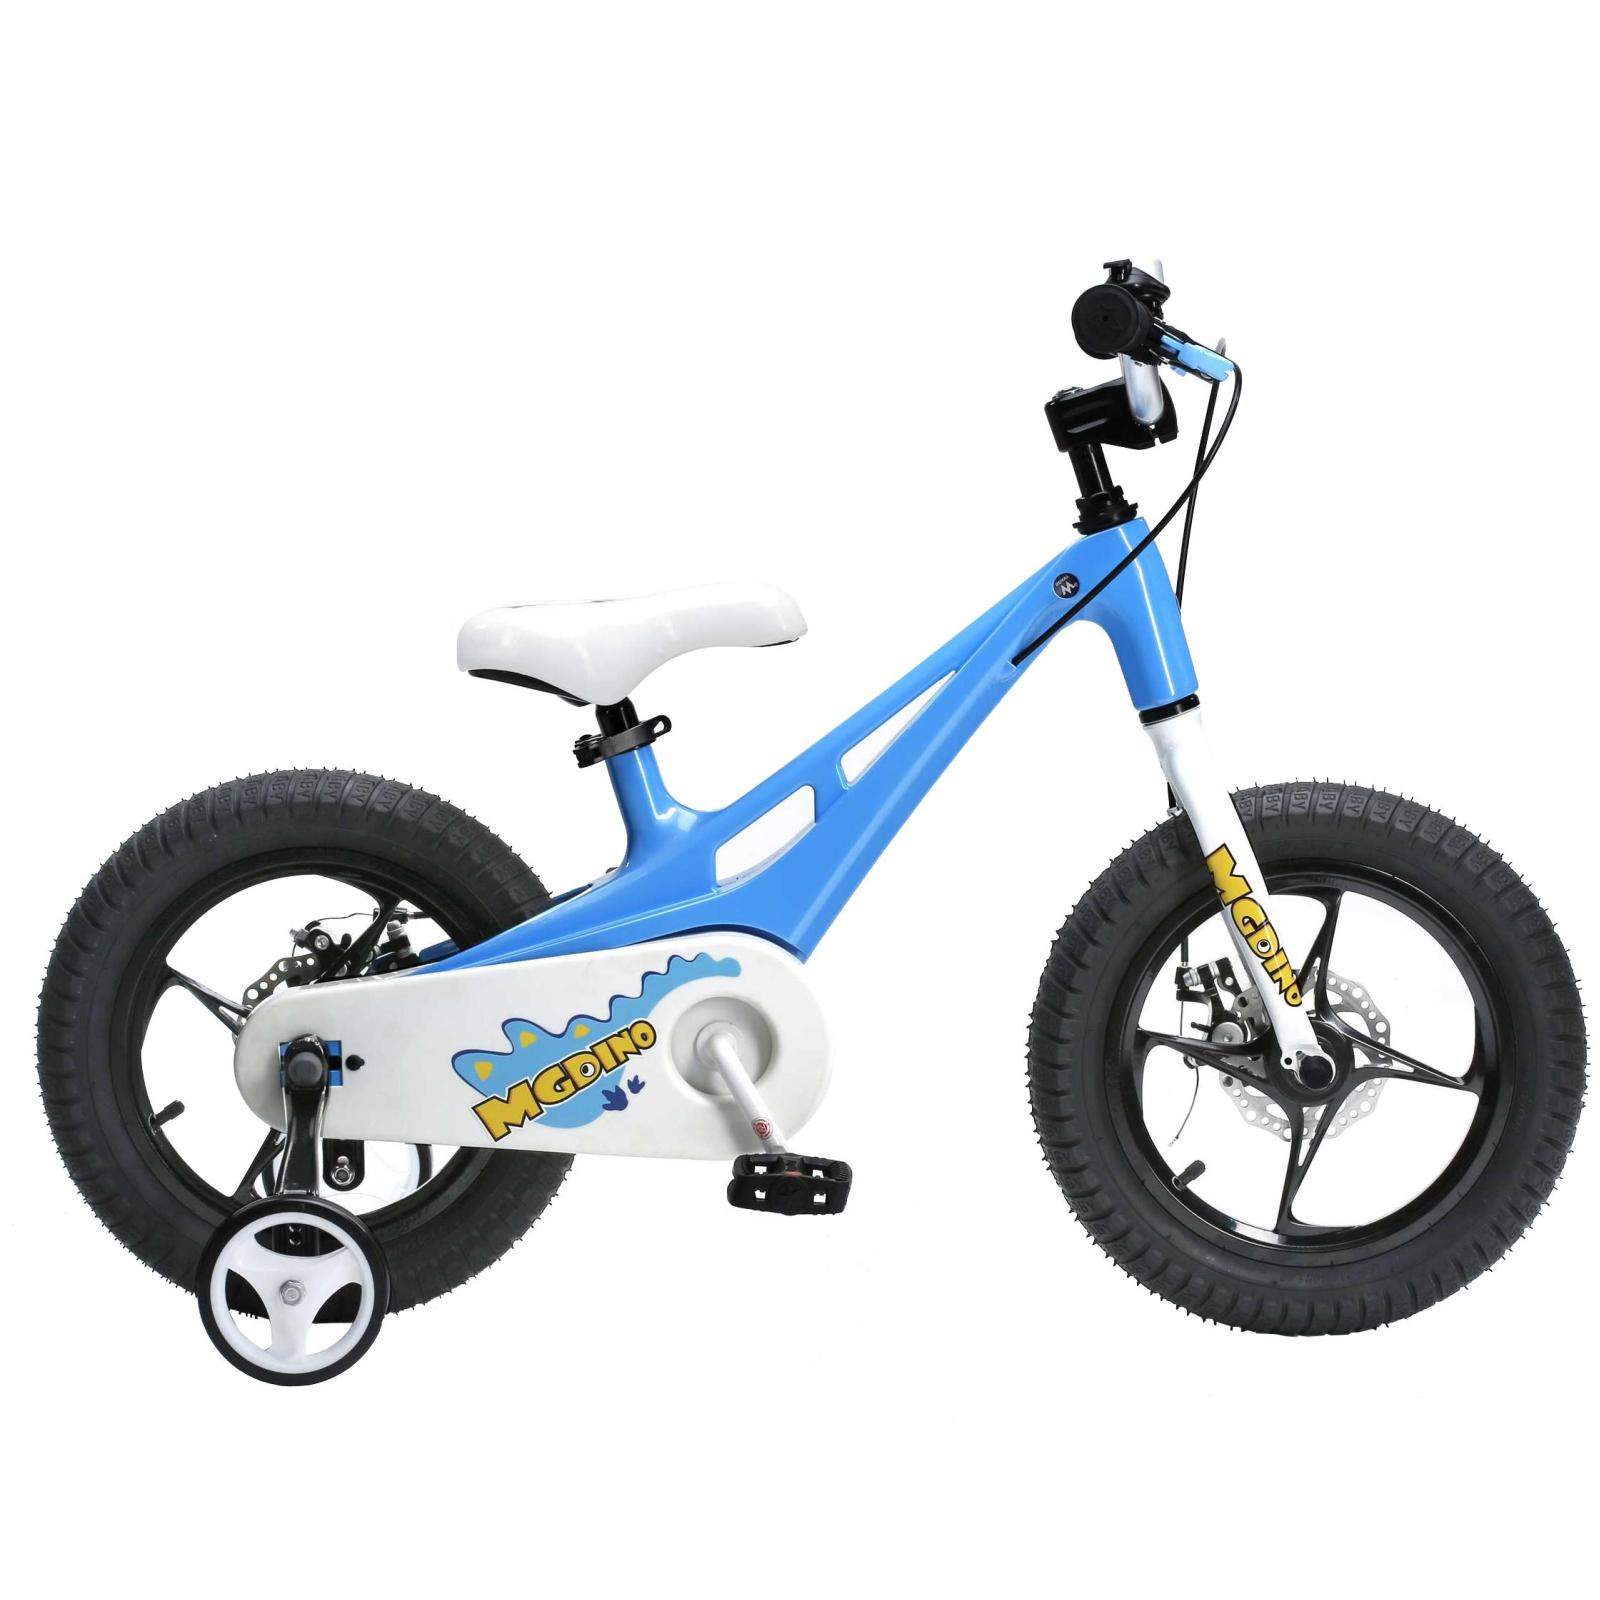 "Детский велосипед Royal Baby MGDINO 14"", синий (RB14-21-BLU)"